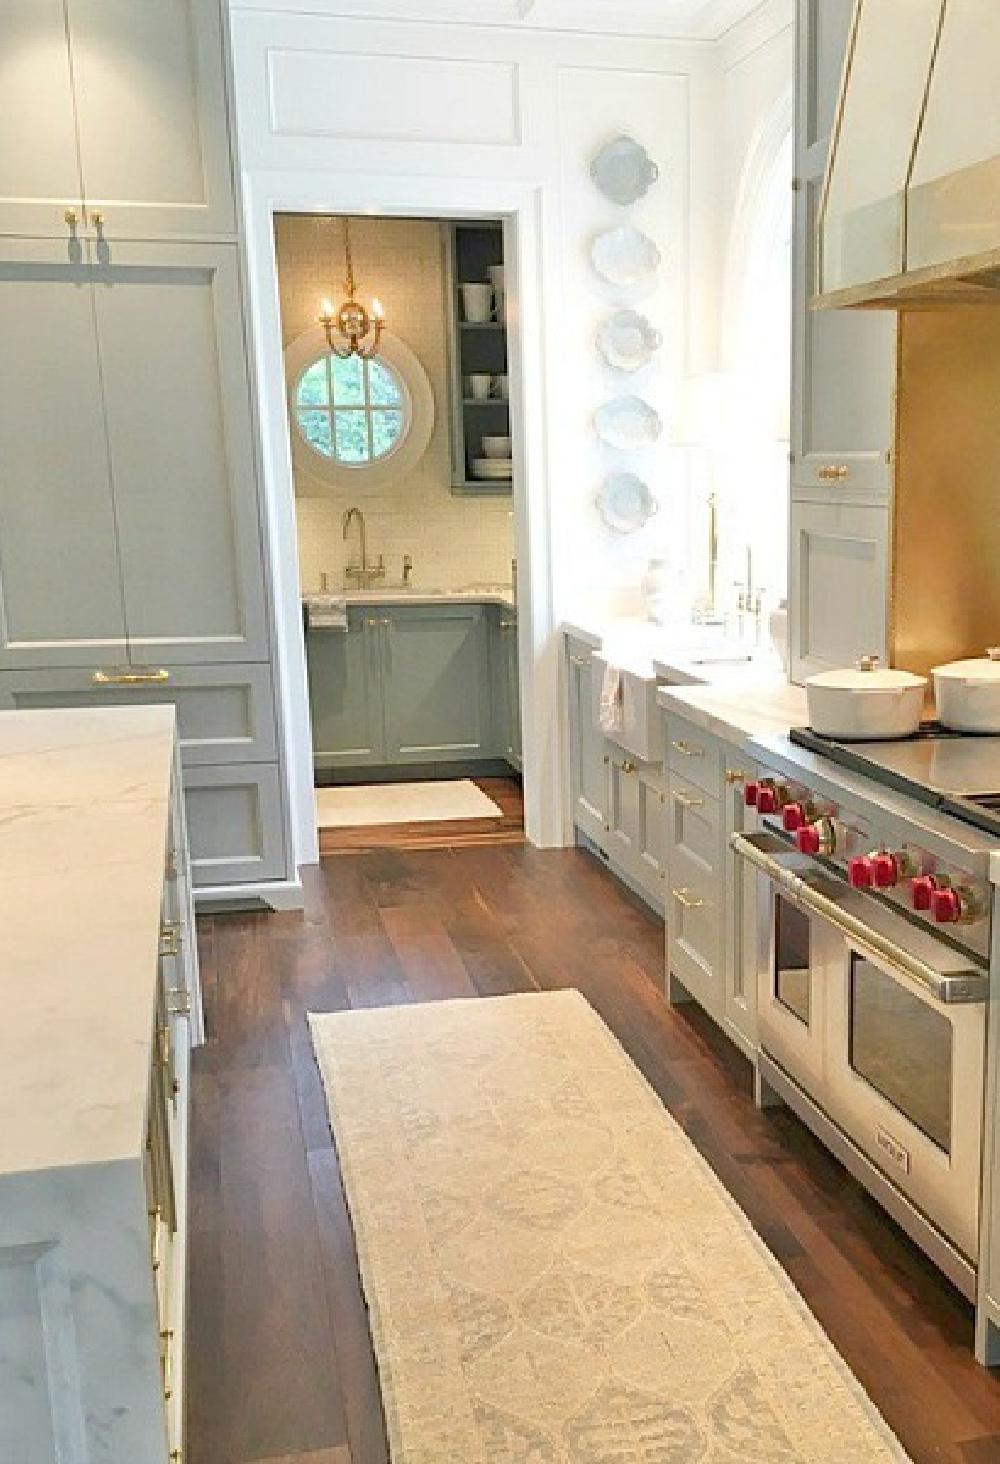 Atlanta Southeastern Designer Showhouse 2017 kitchen with Farrow & Ball Light Blue cabinets and brass hardware.#bluekitchen #farrowandballlightblue #timelesskitchen #kitchendesign #traditionalkitchen